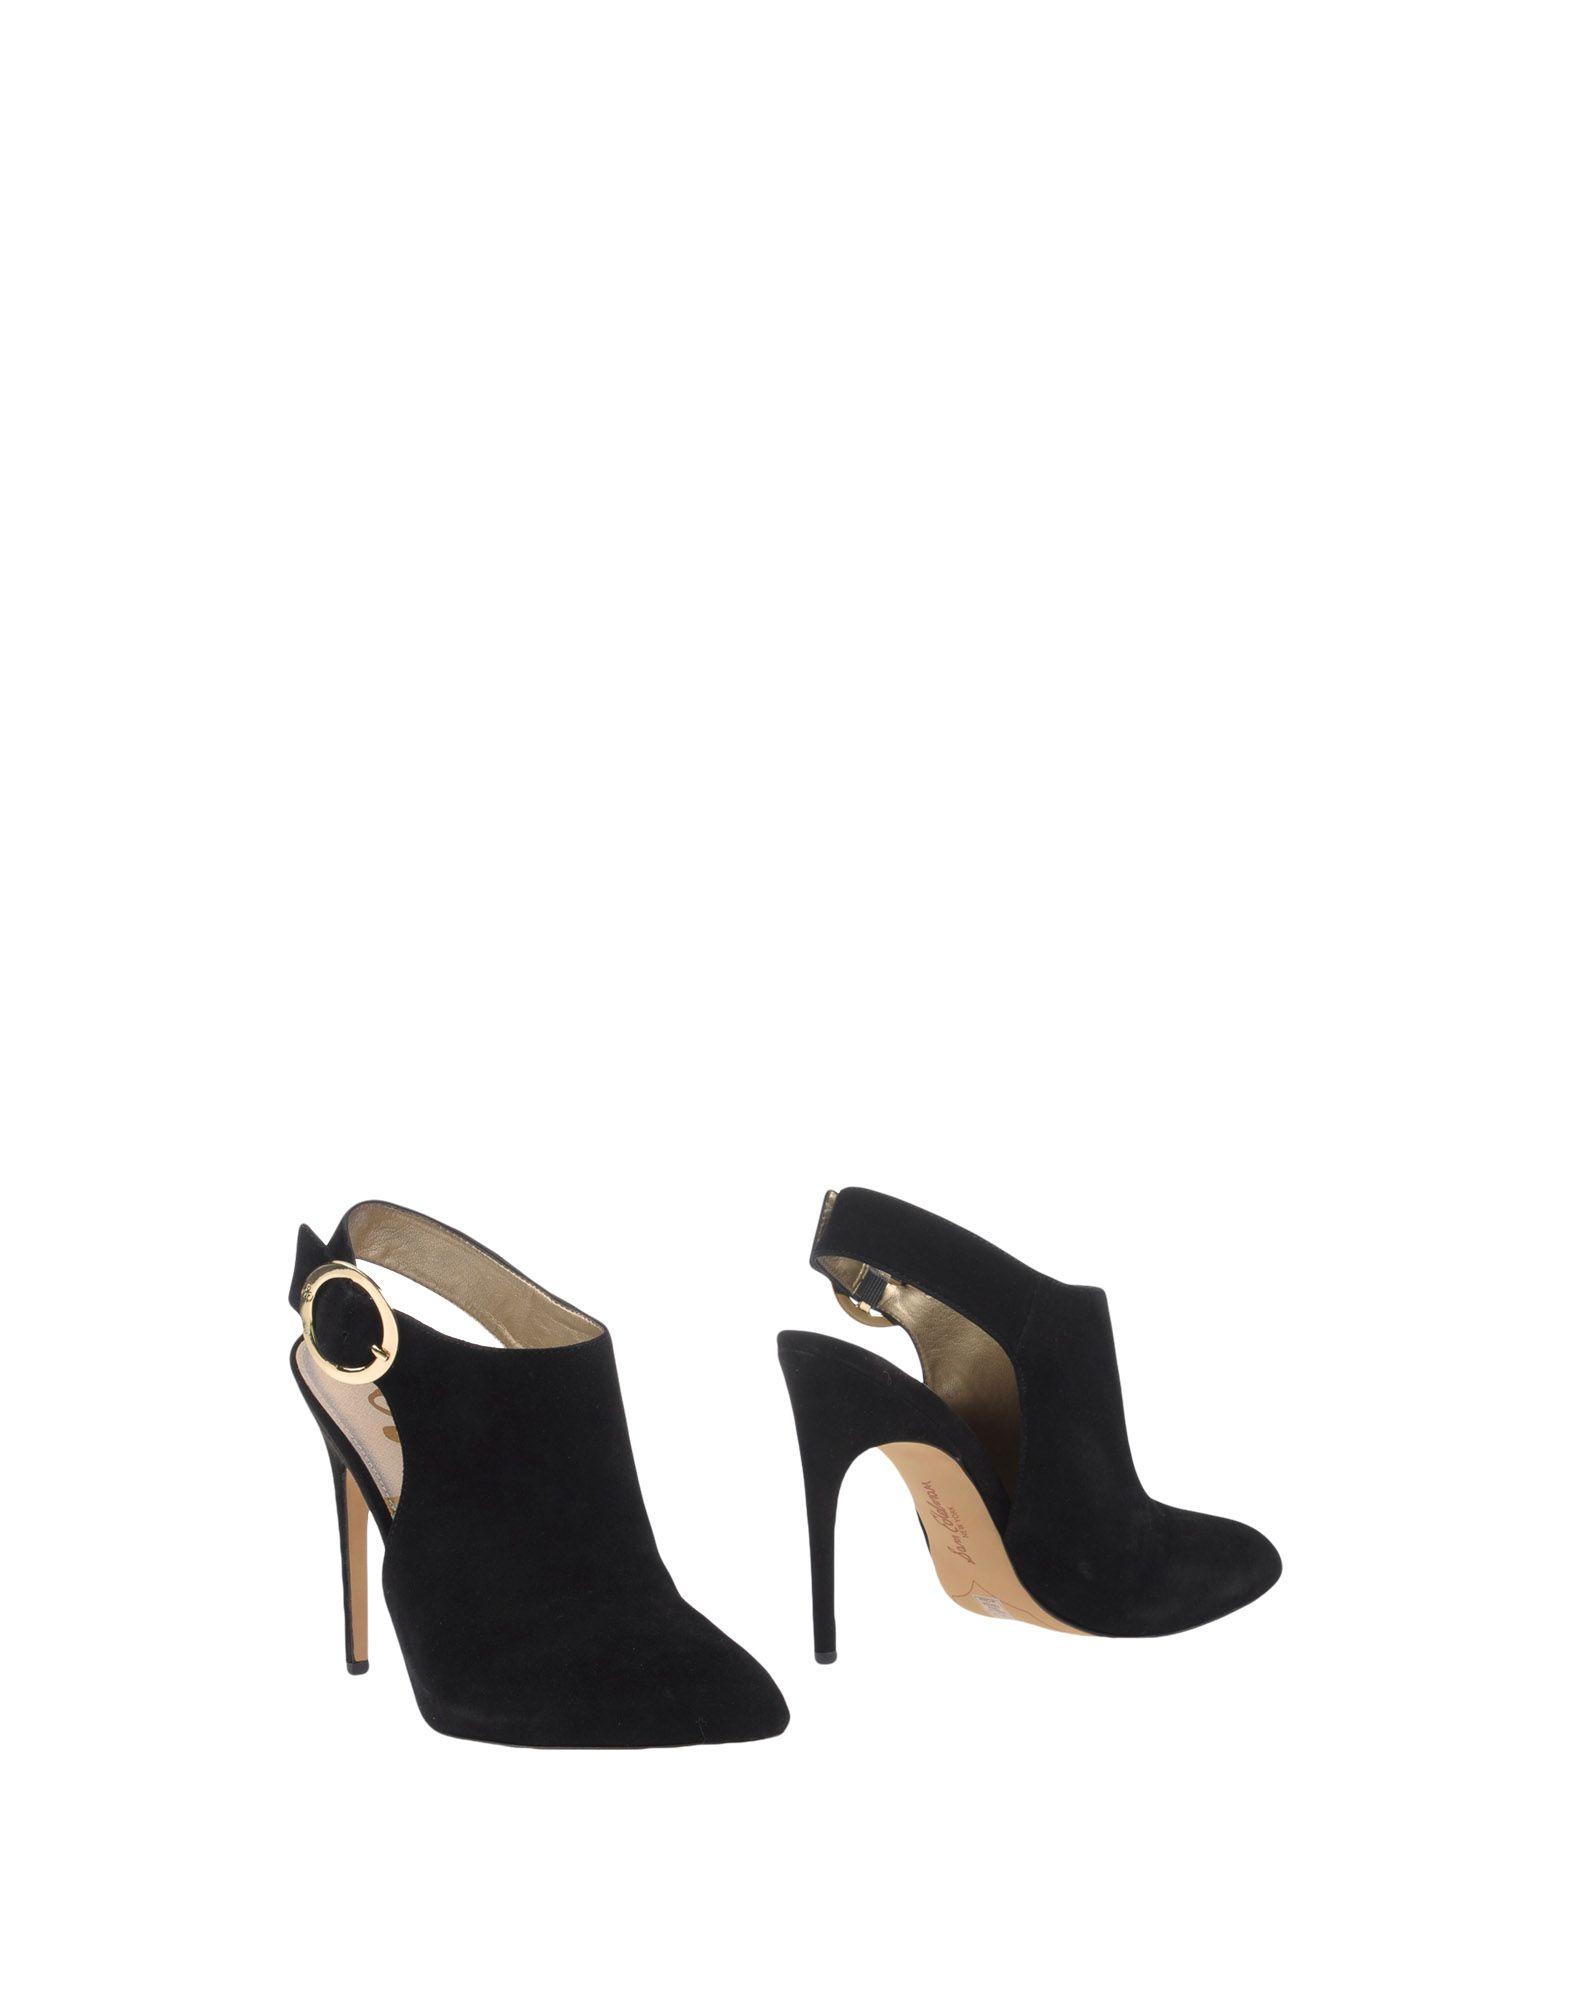 Sam Edelman Stiefelette Damen  Schuhe 11199493LT Gute Qualität beliebte Schuhe  ea9a65